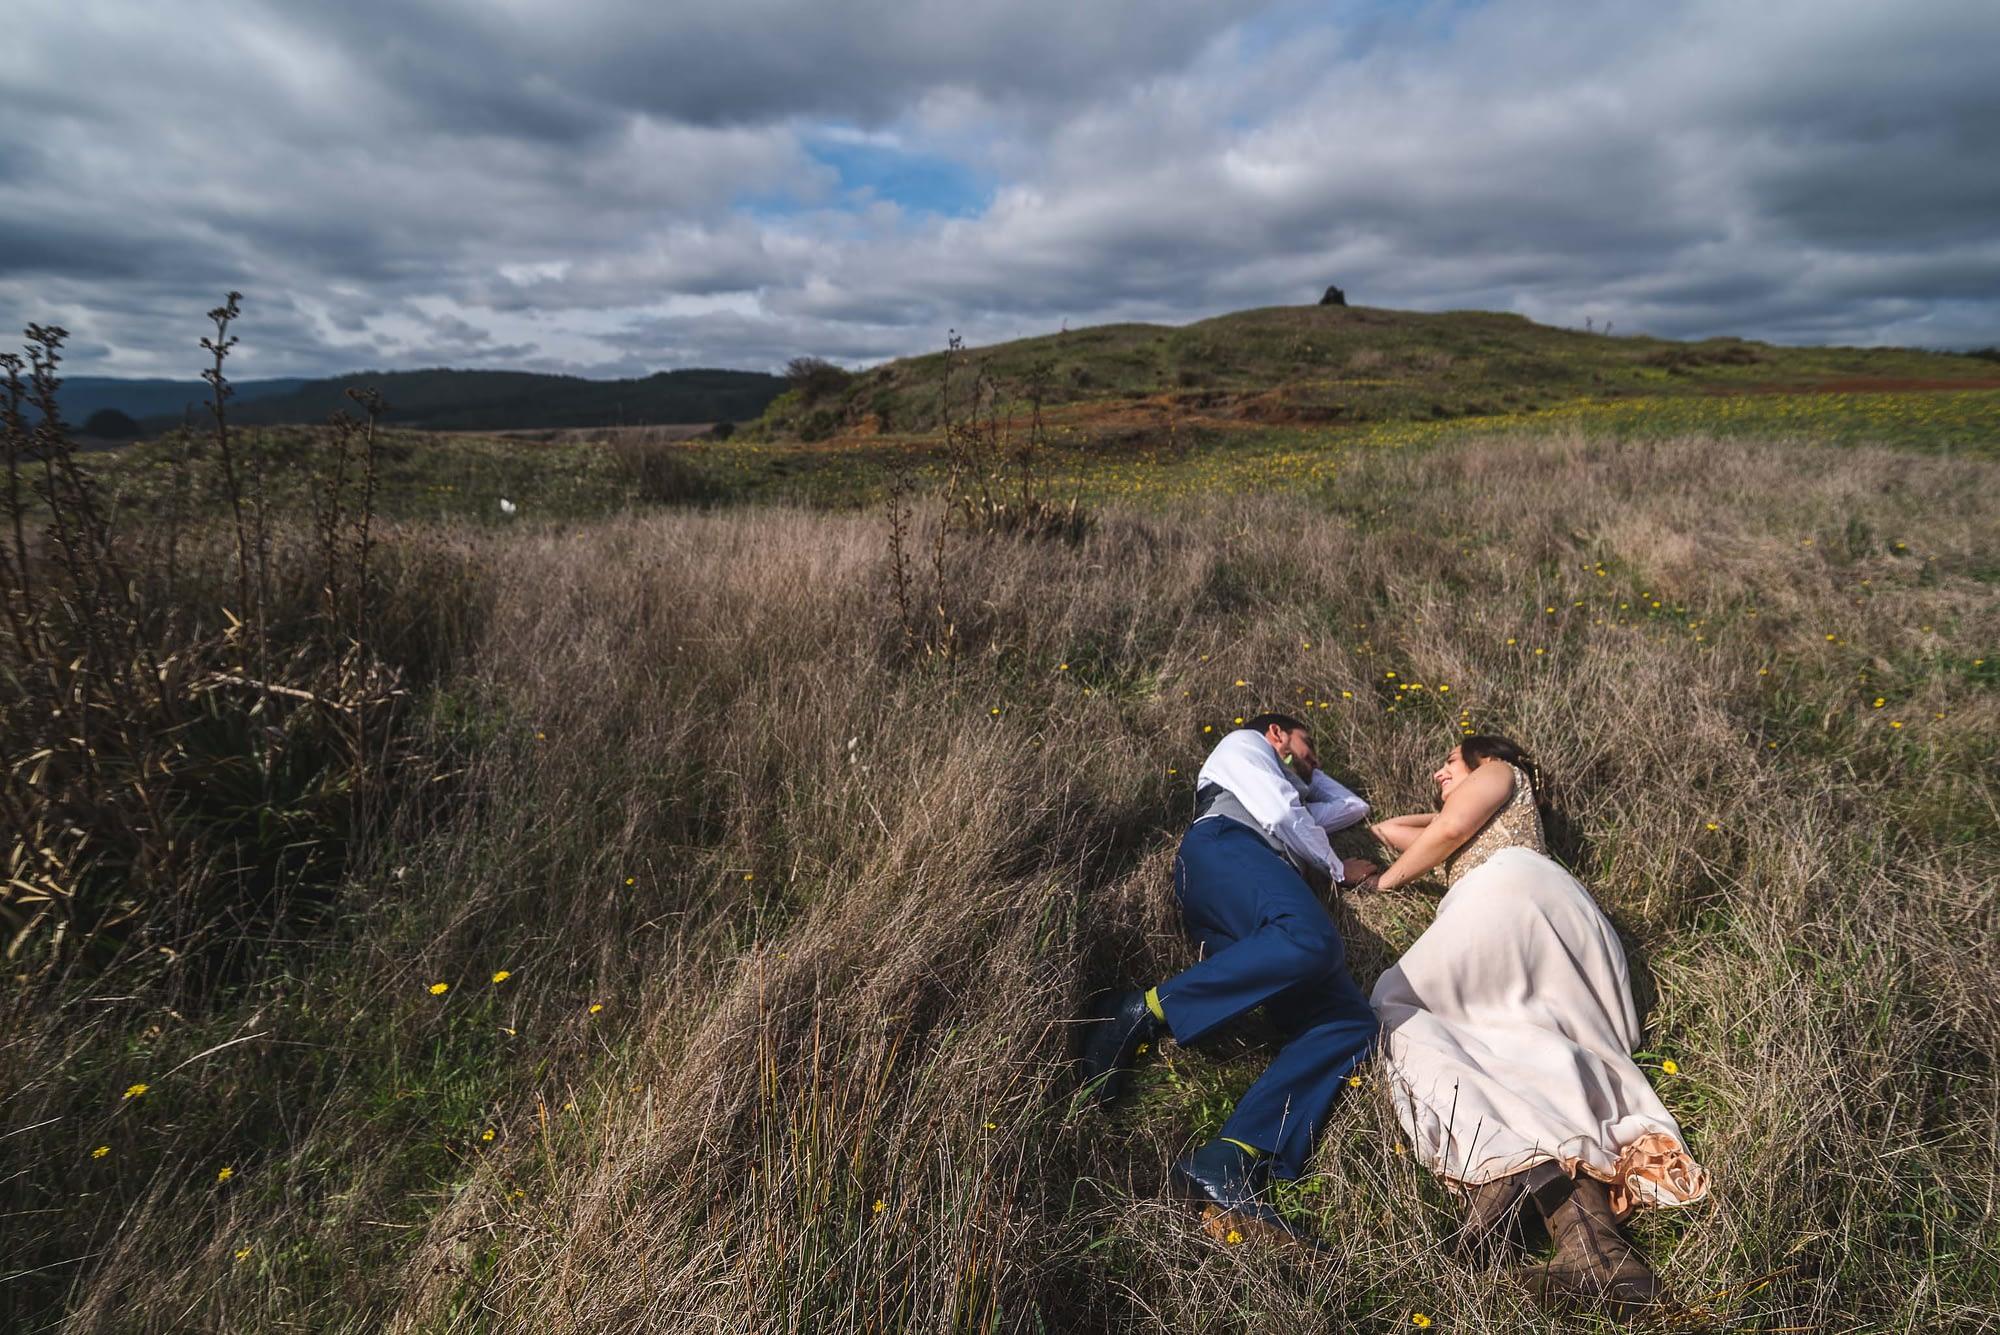 fotografo de matrimonios-fotografo profesional-trash the dress-diego mena fotógrafo